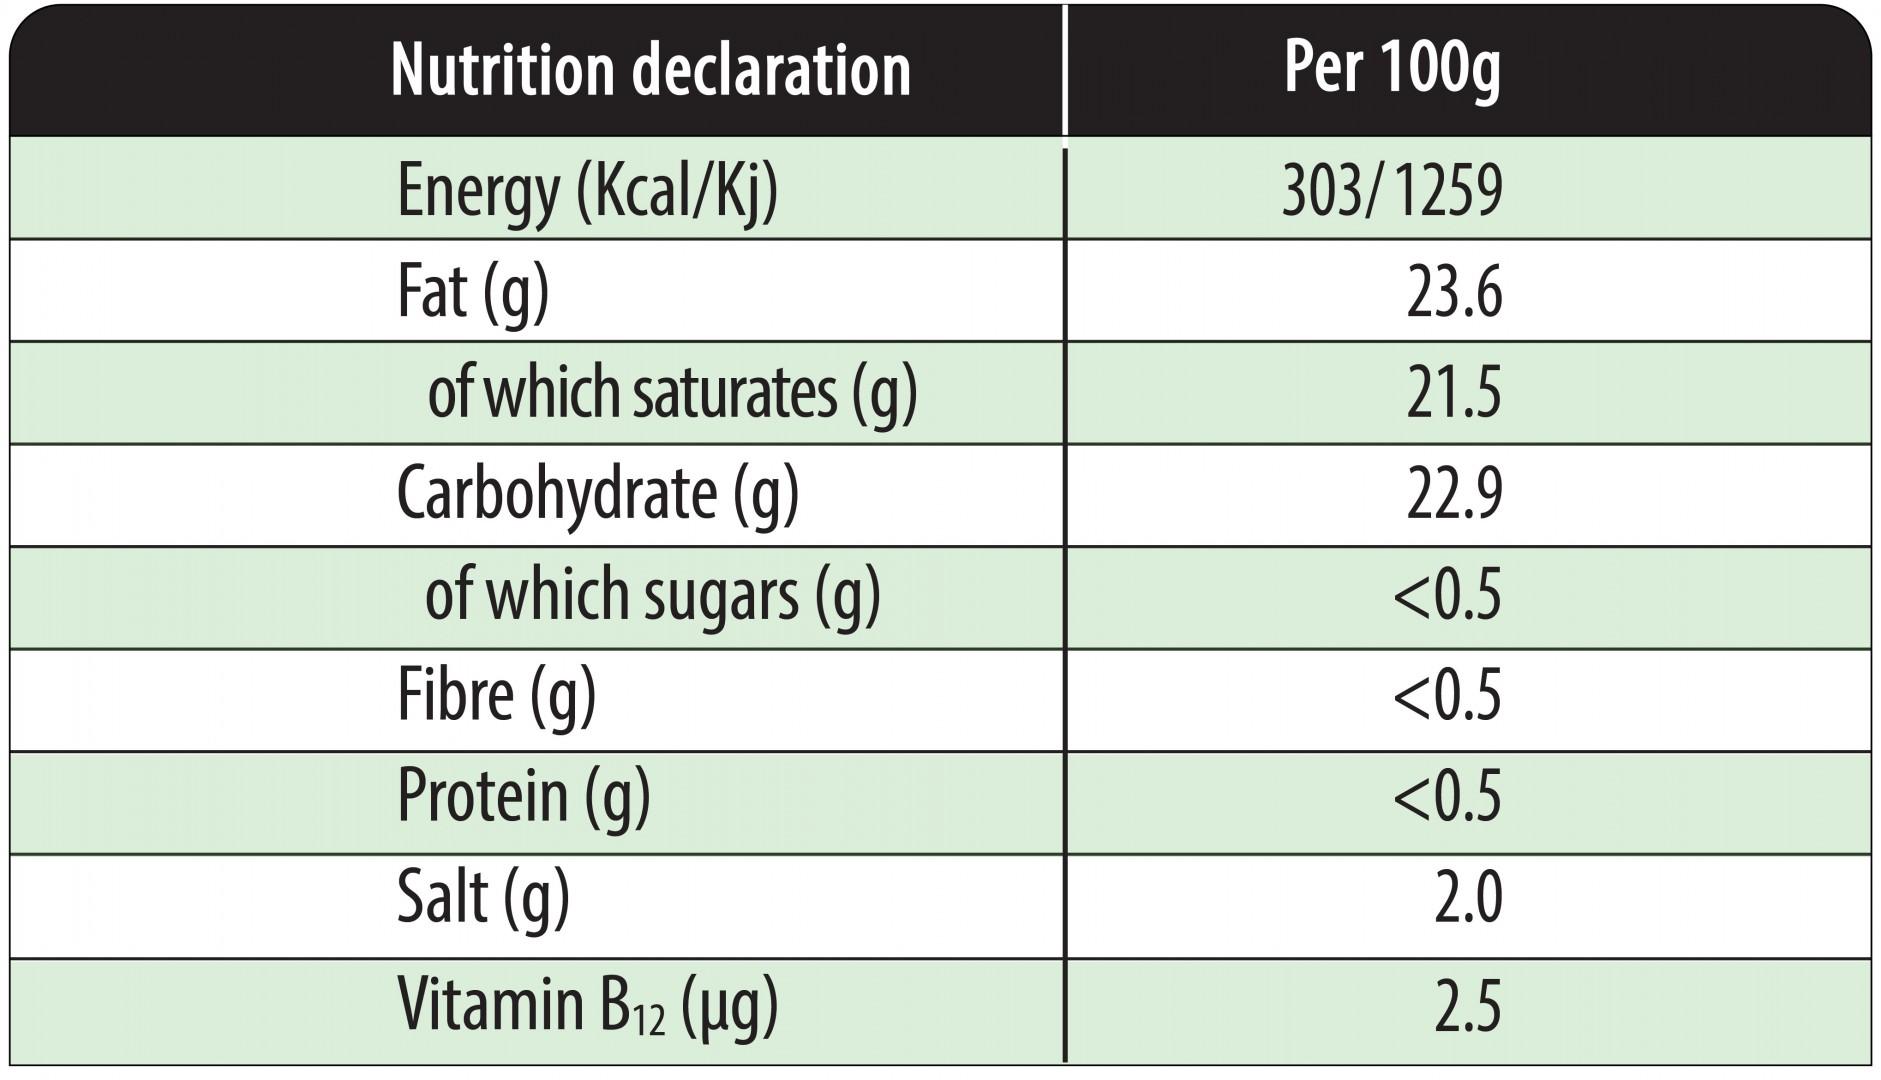 Nutrition Declaration - Vintage Cheddar